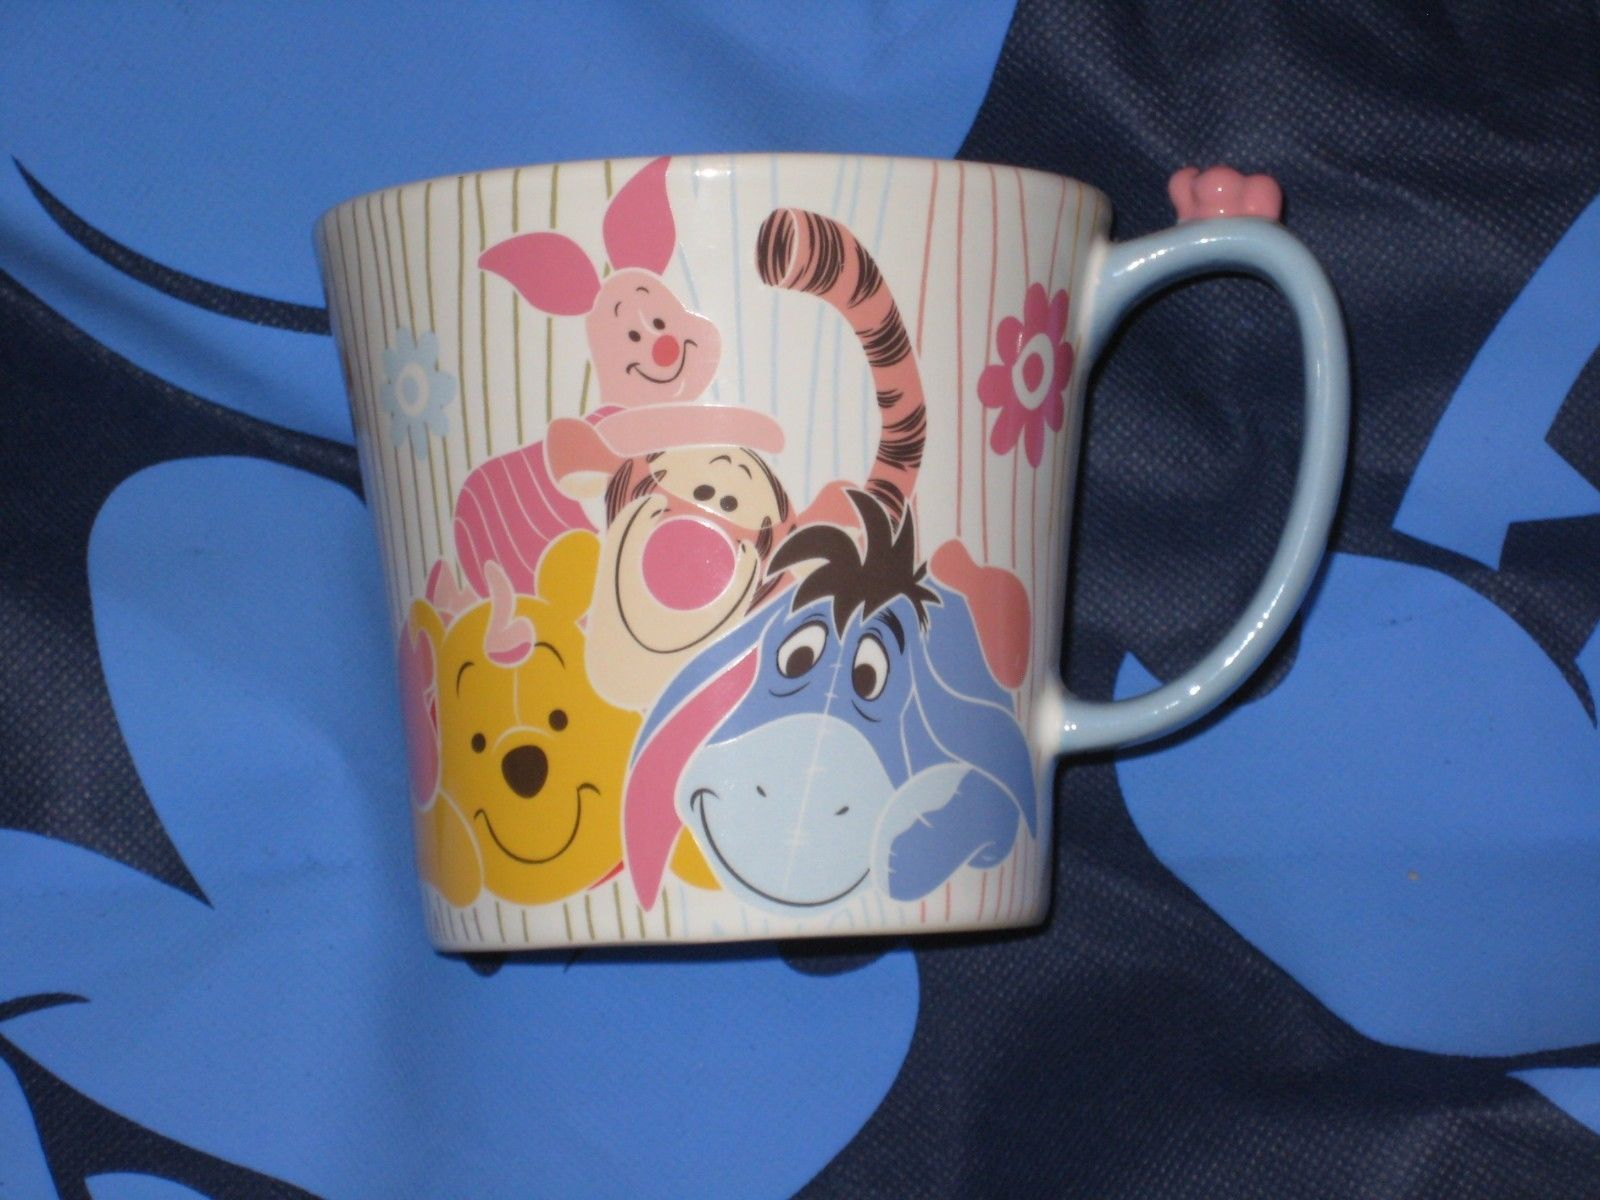 DISNEY STORE Winnie the Pooh COFFEE CUP/MUG. BRAND NEW.